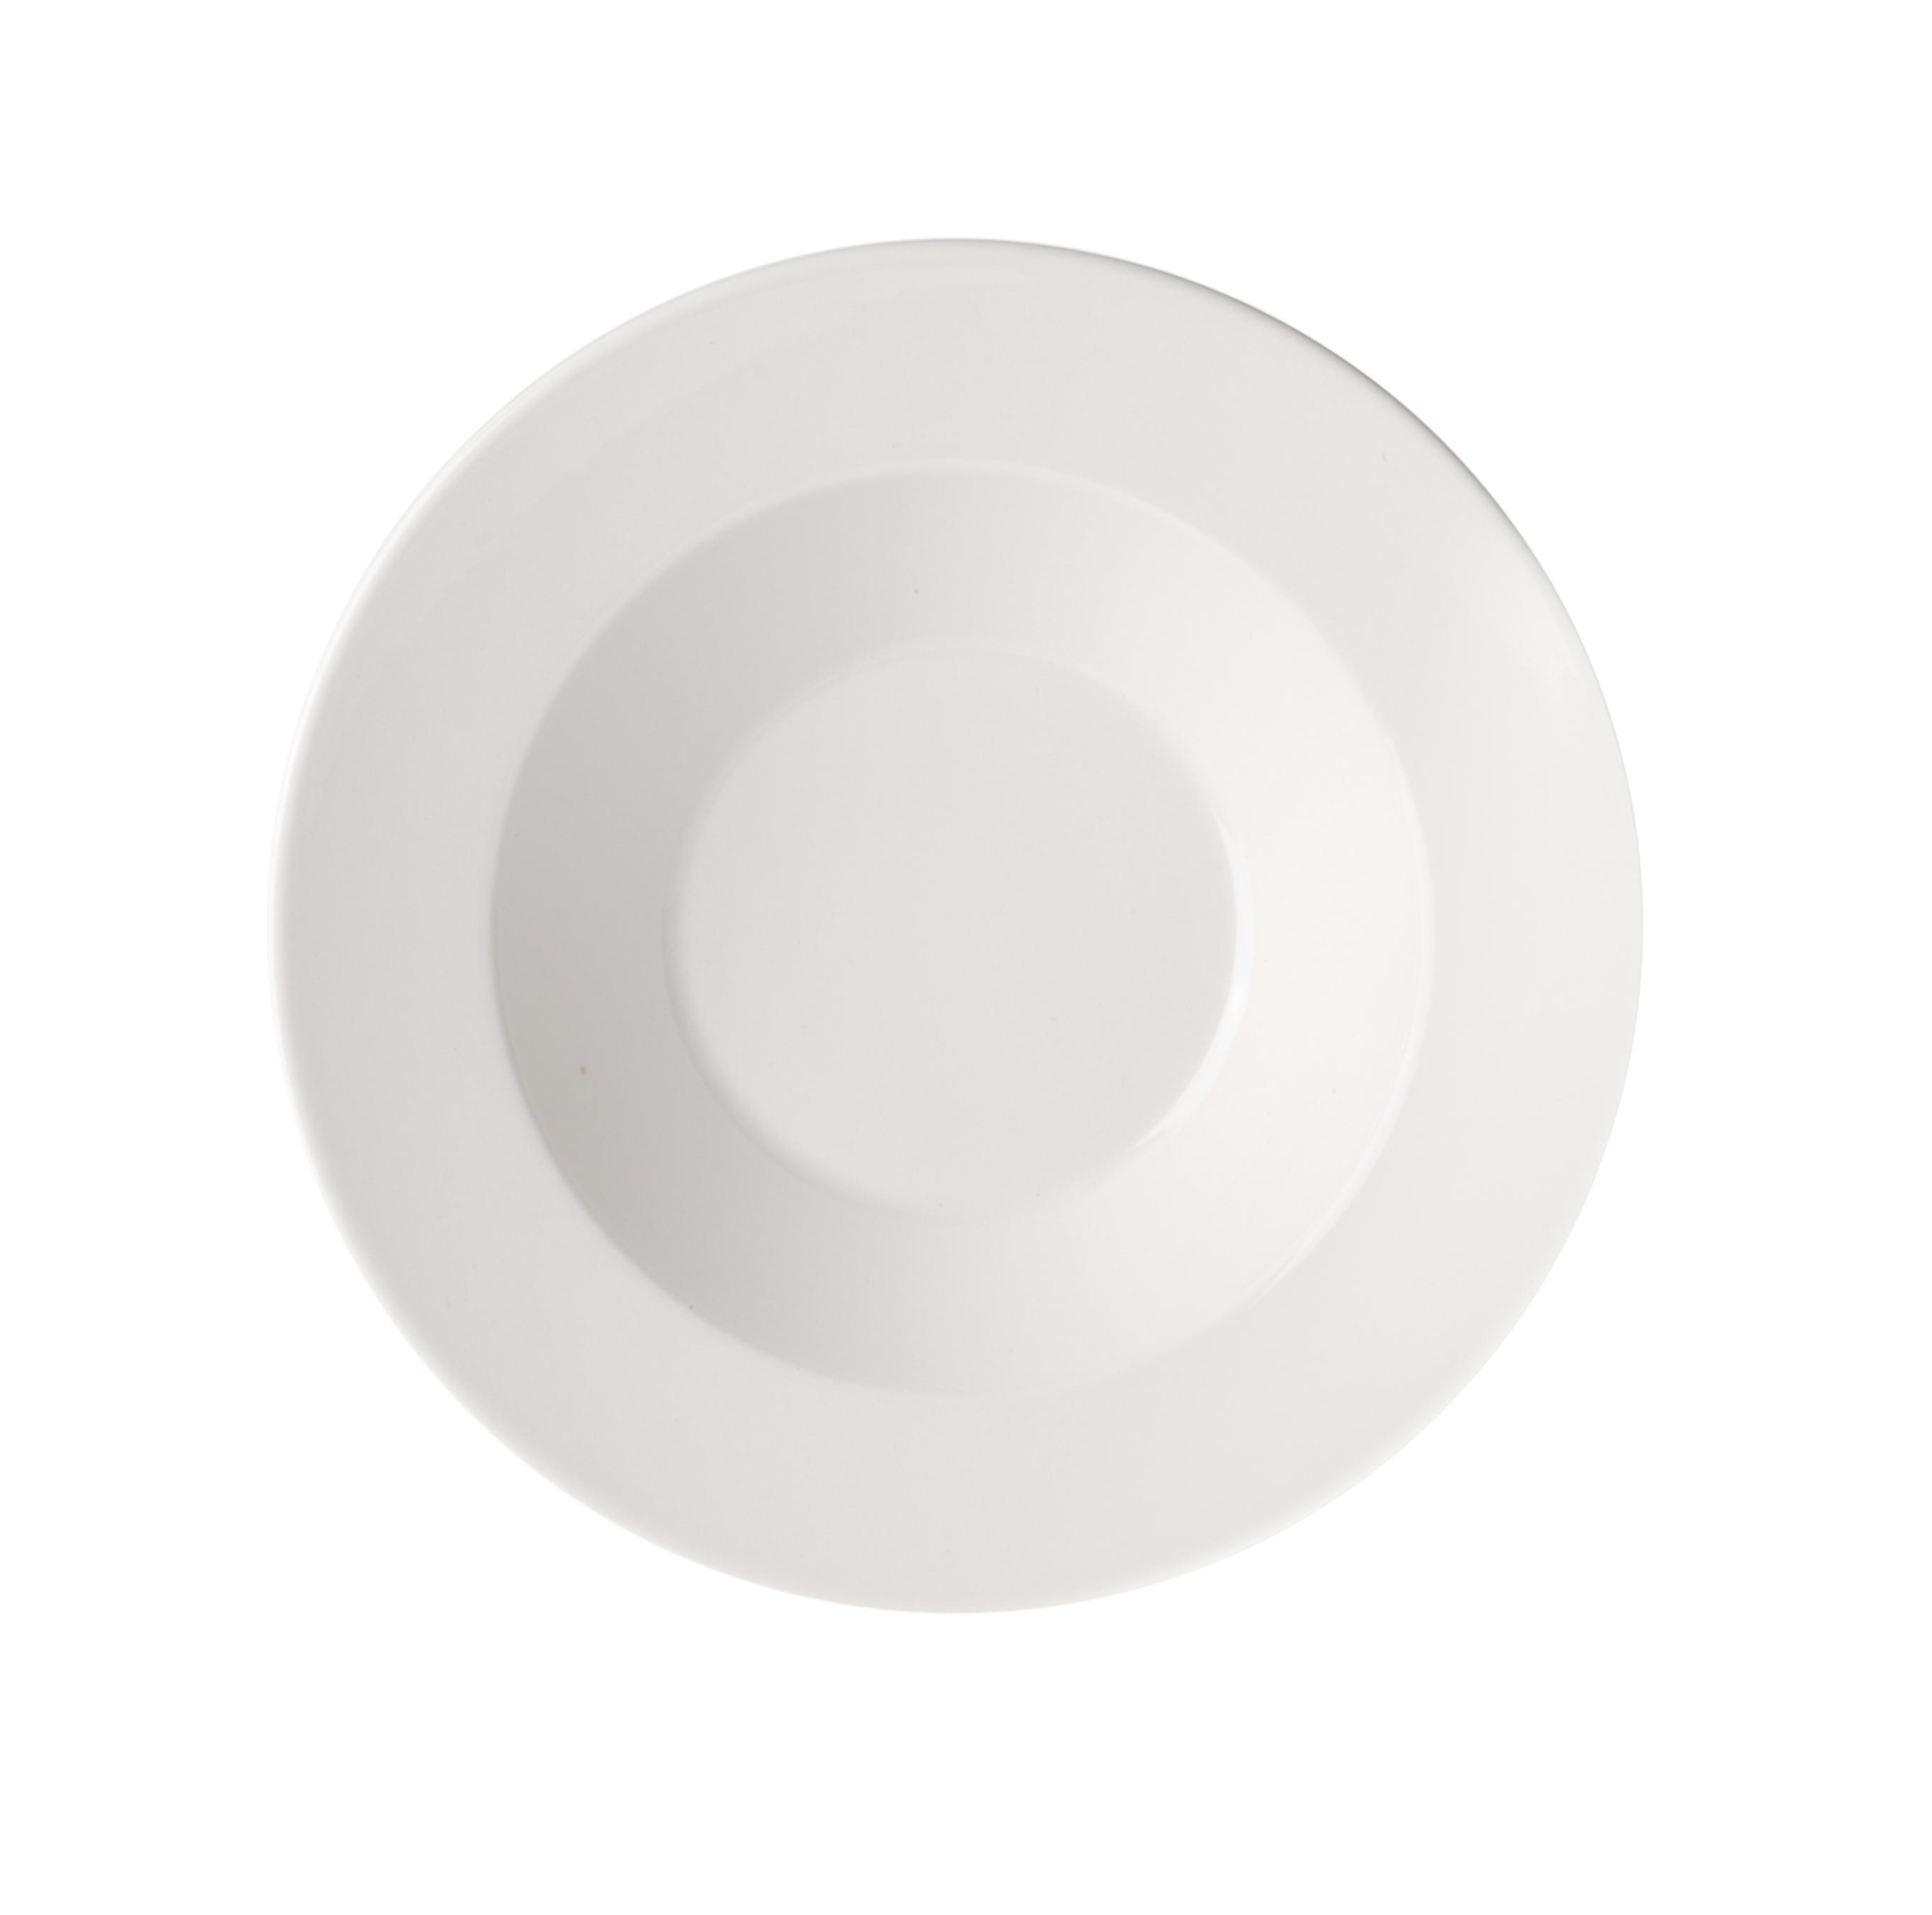 KoKo Tallrik djup 24 cm vit